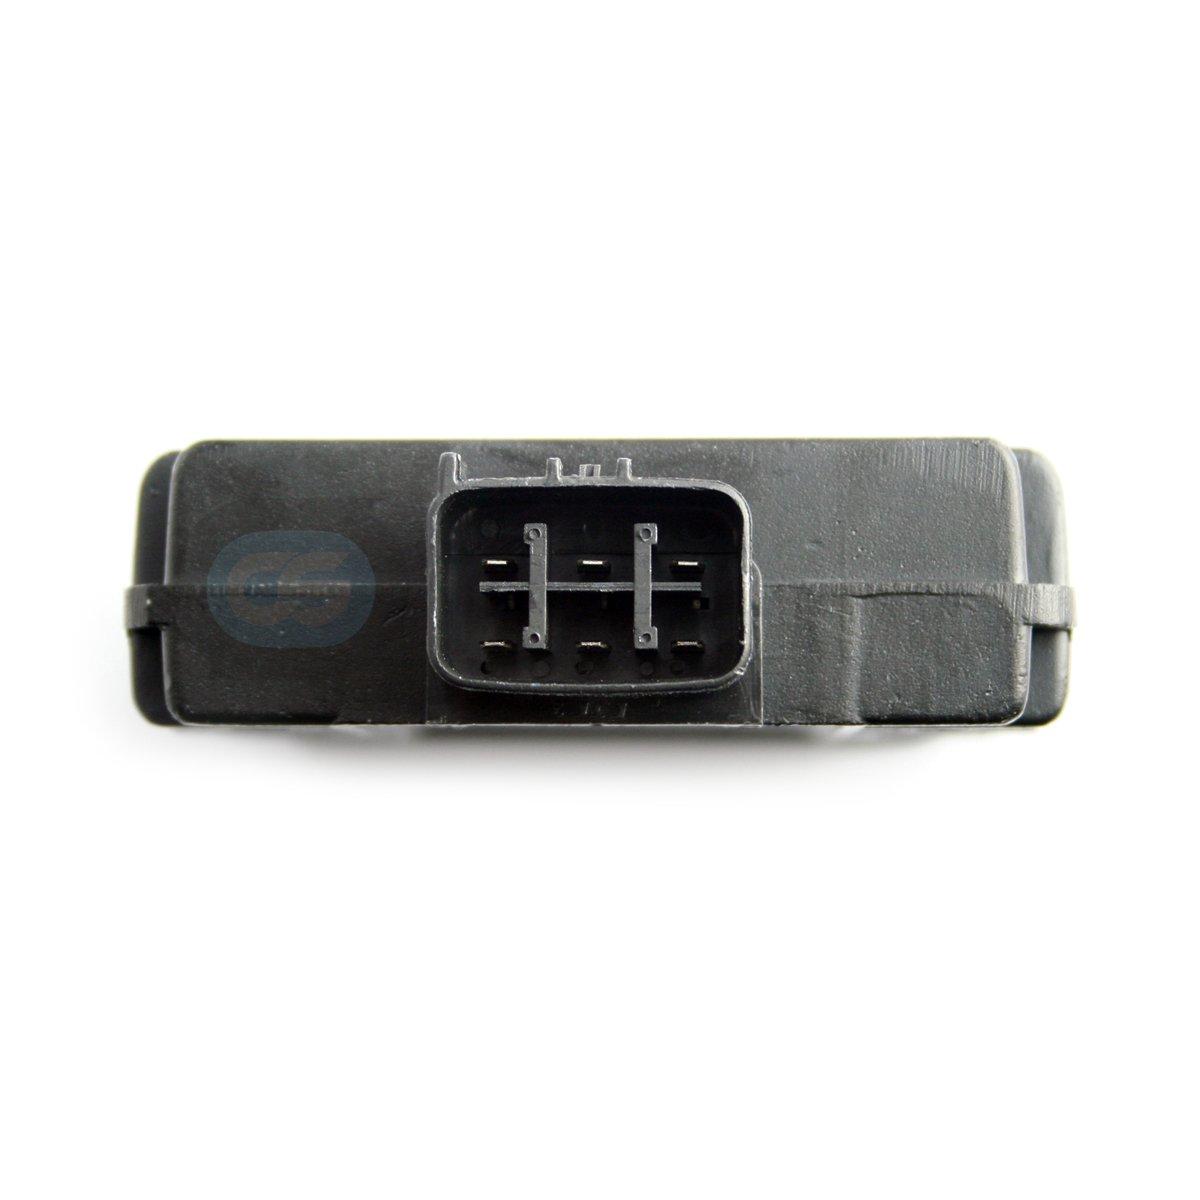 Warranty 04-07 Rectifier Regulator Suzuki 500 Lt A500 Lt-a500f Vinson 4x4 Automatic